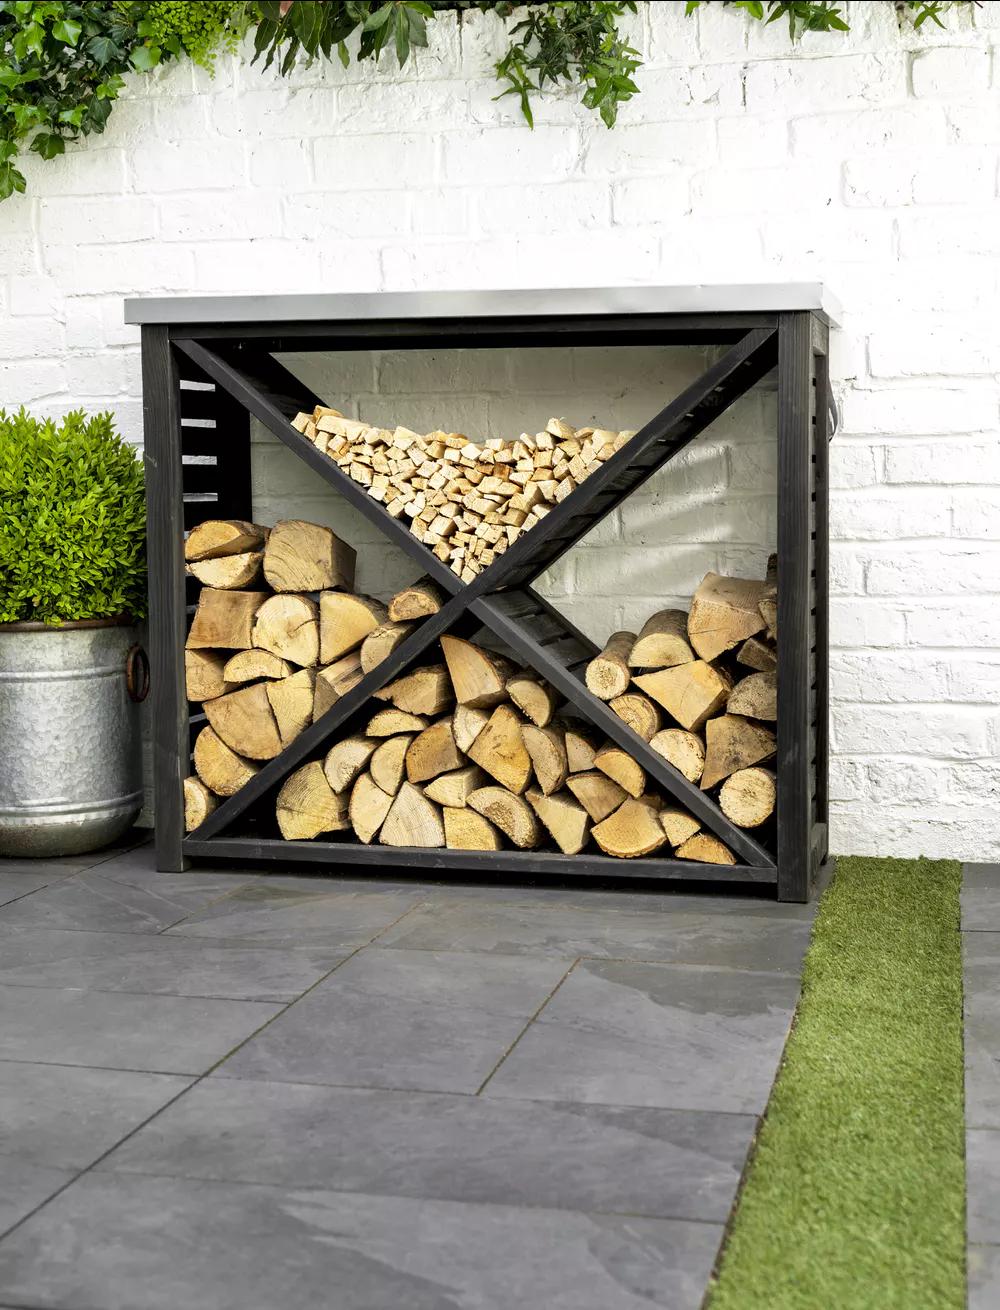 Moreton Cross Log Store Firewood Storage Outdoor Firewood Storage Outdoor Firewood Rack